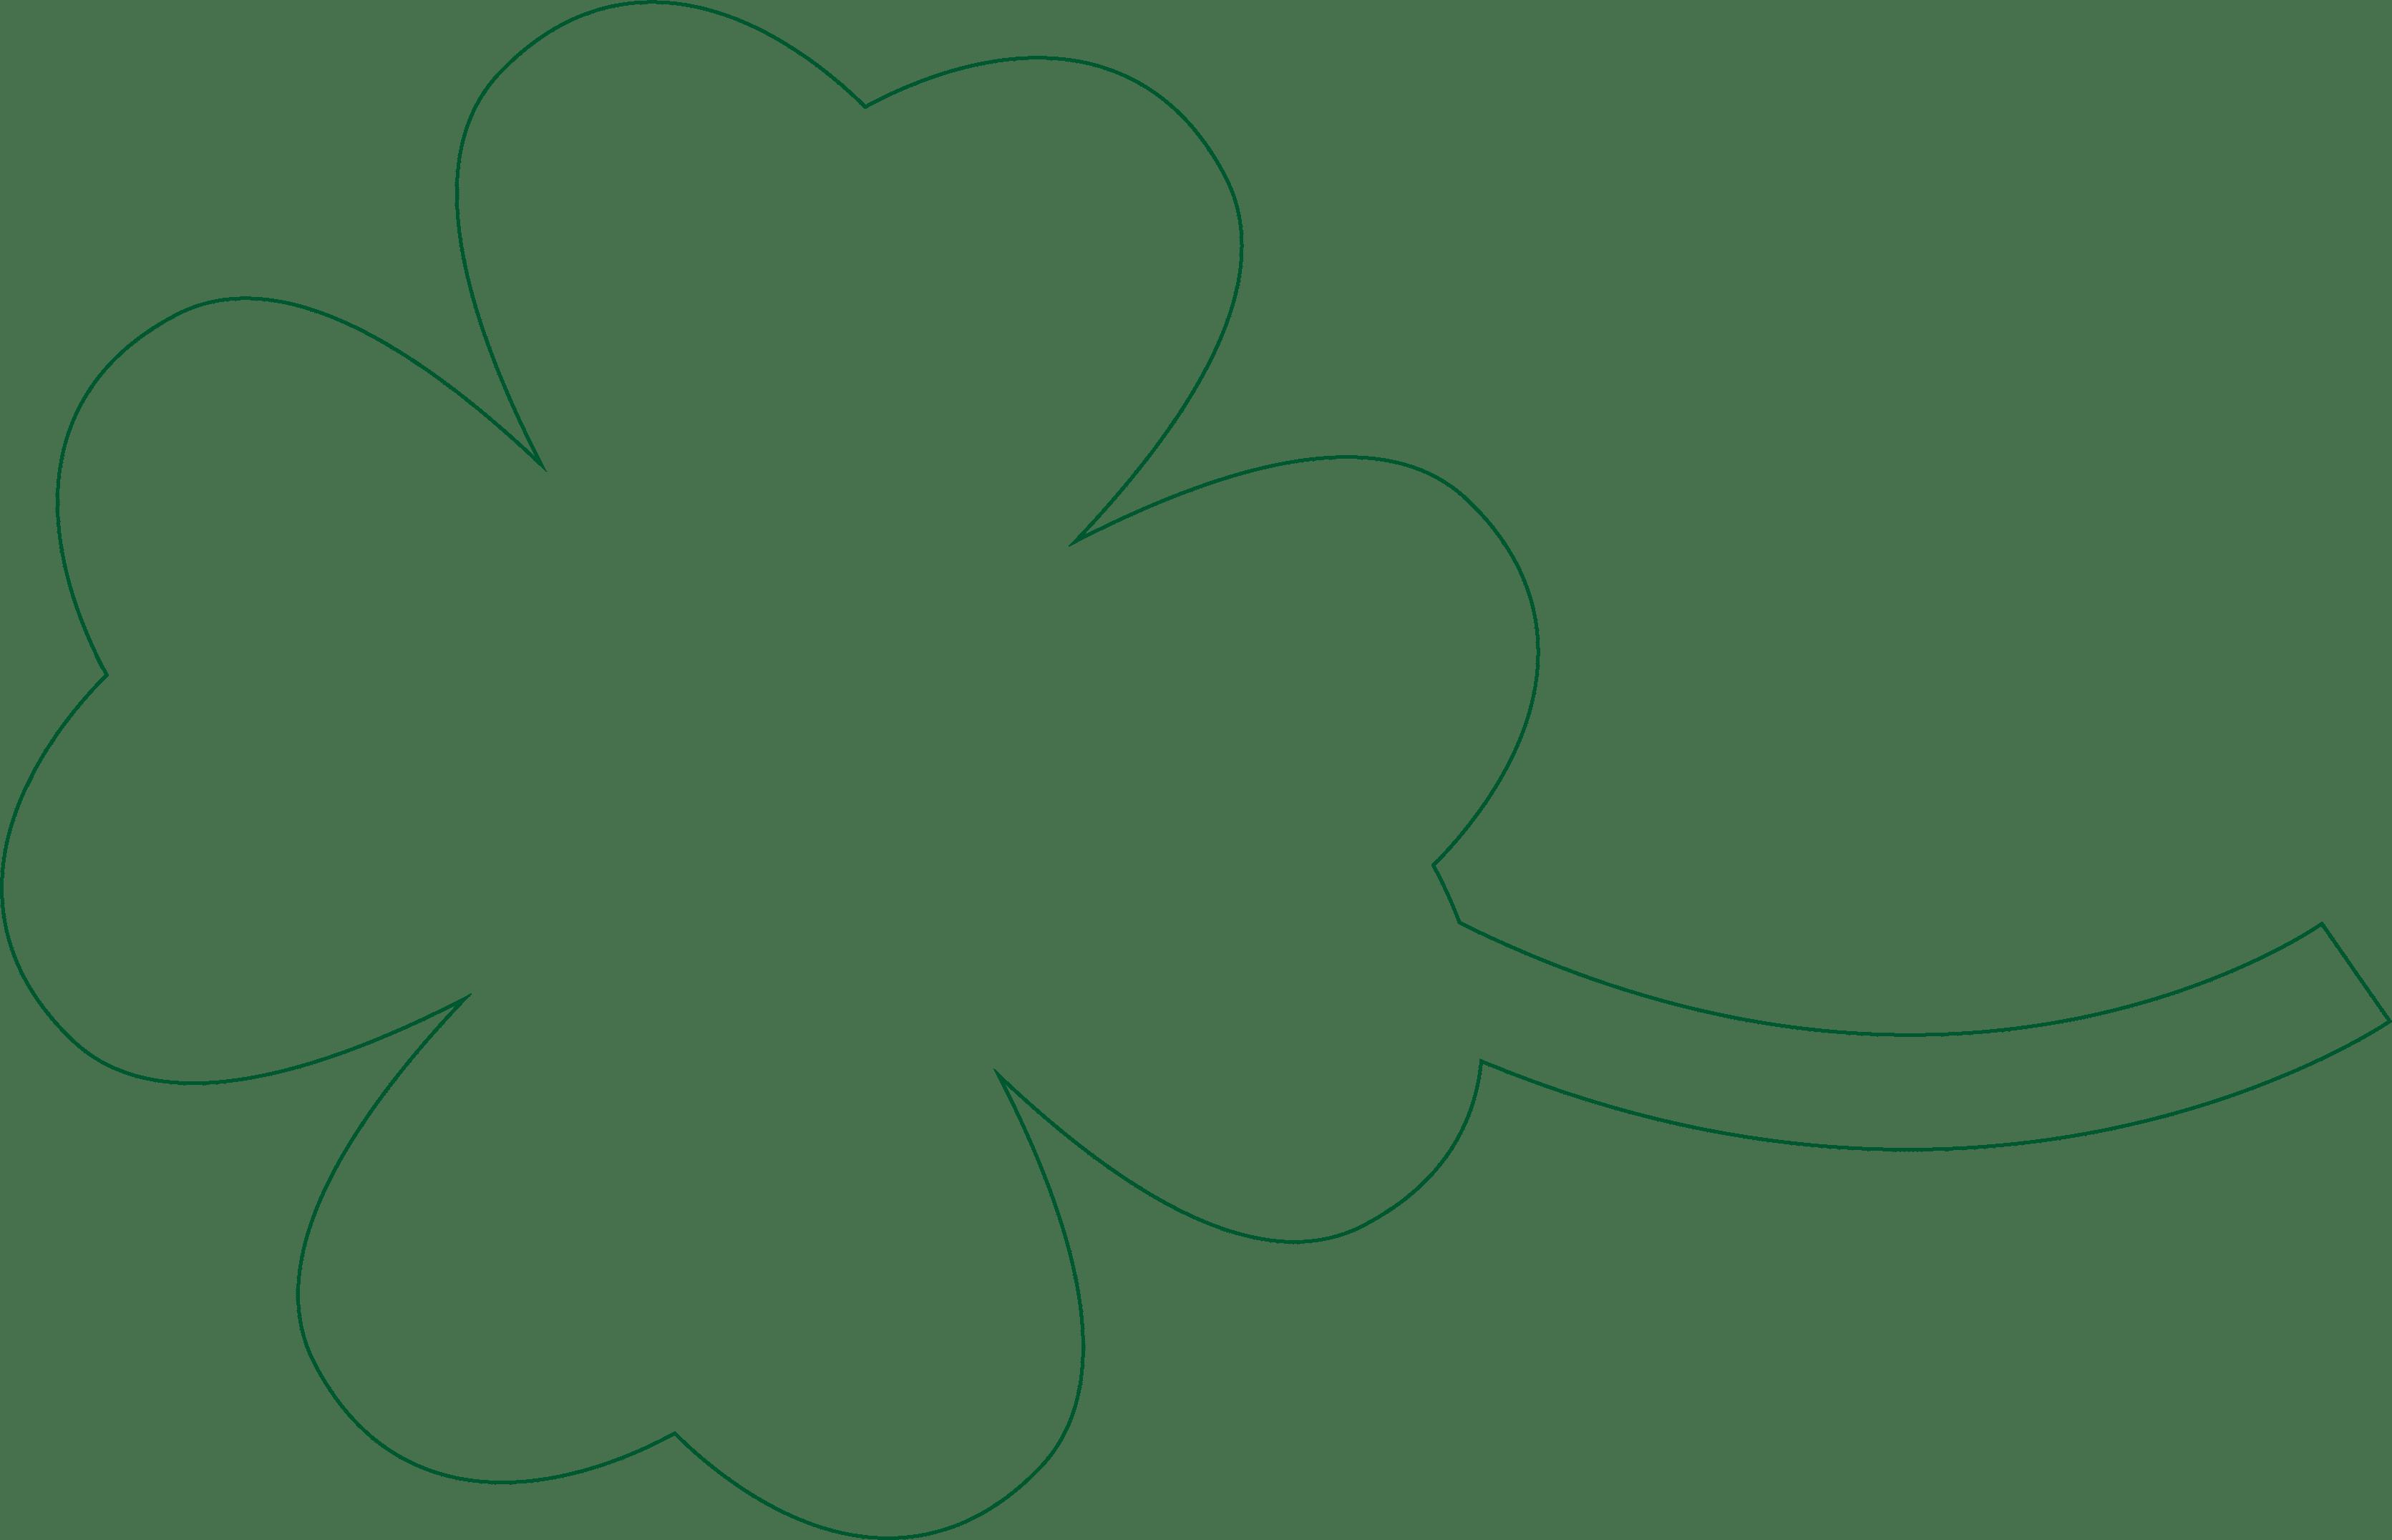 trefle greenet